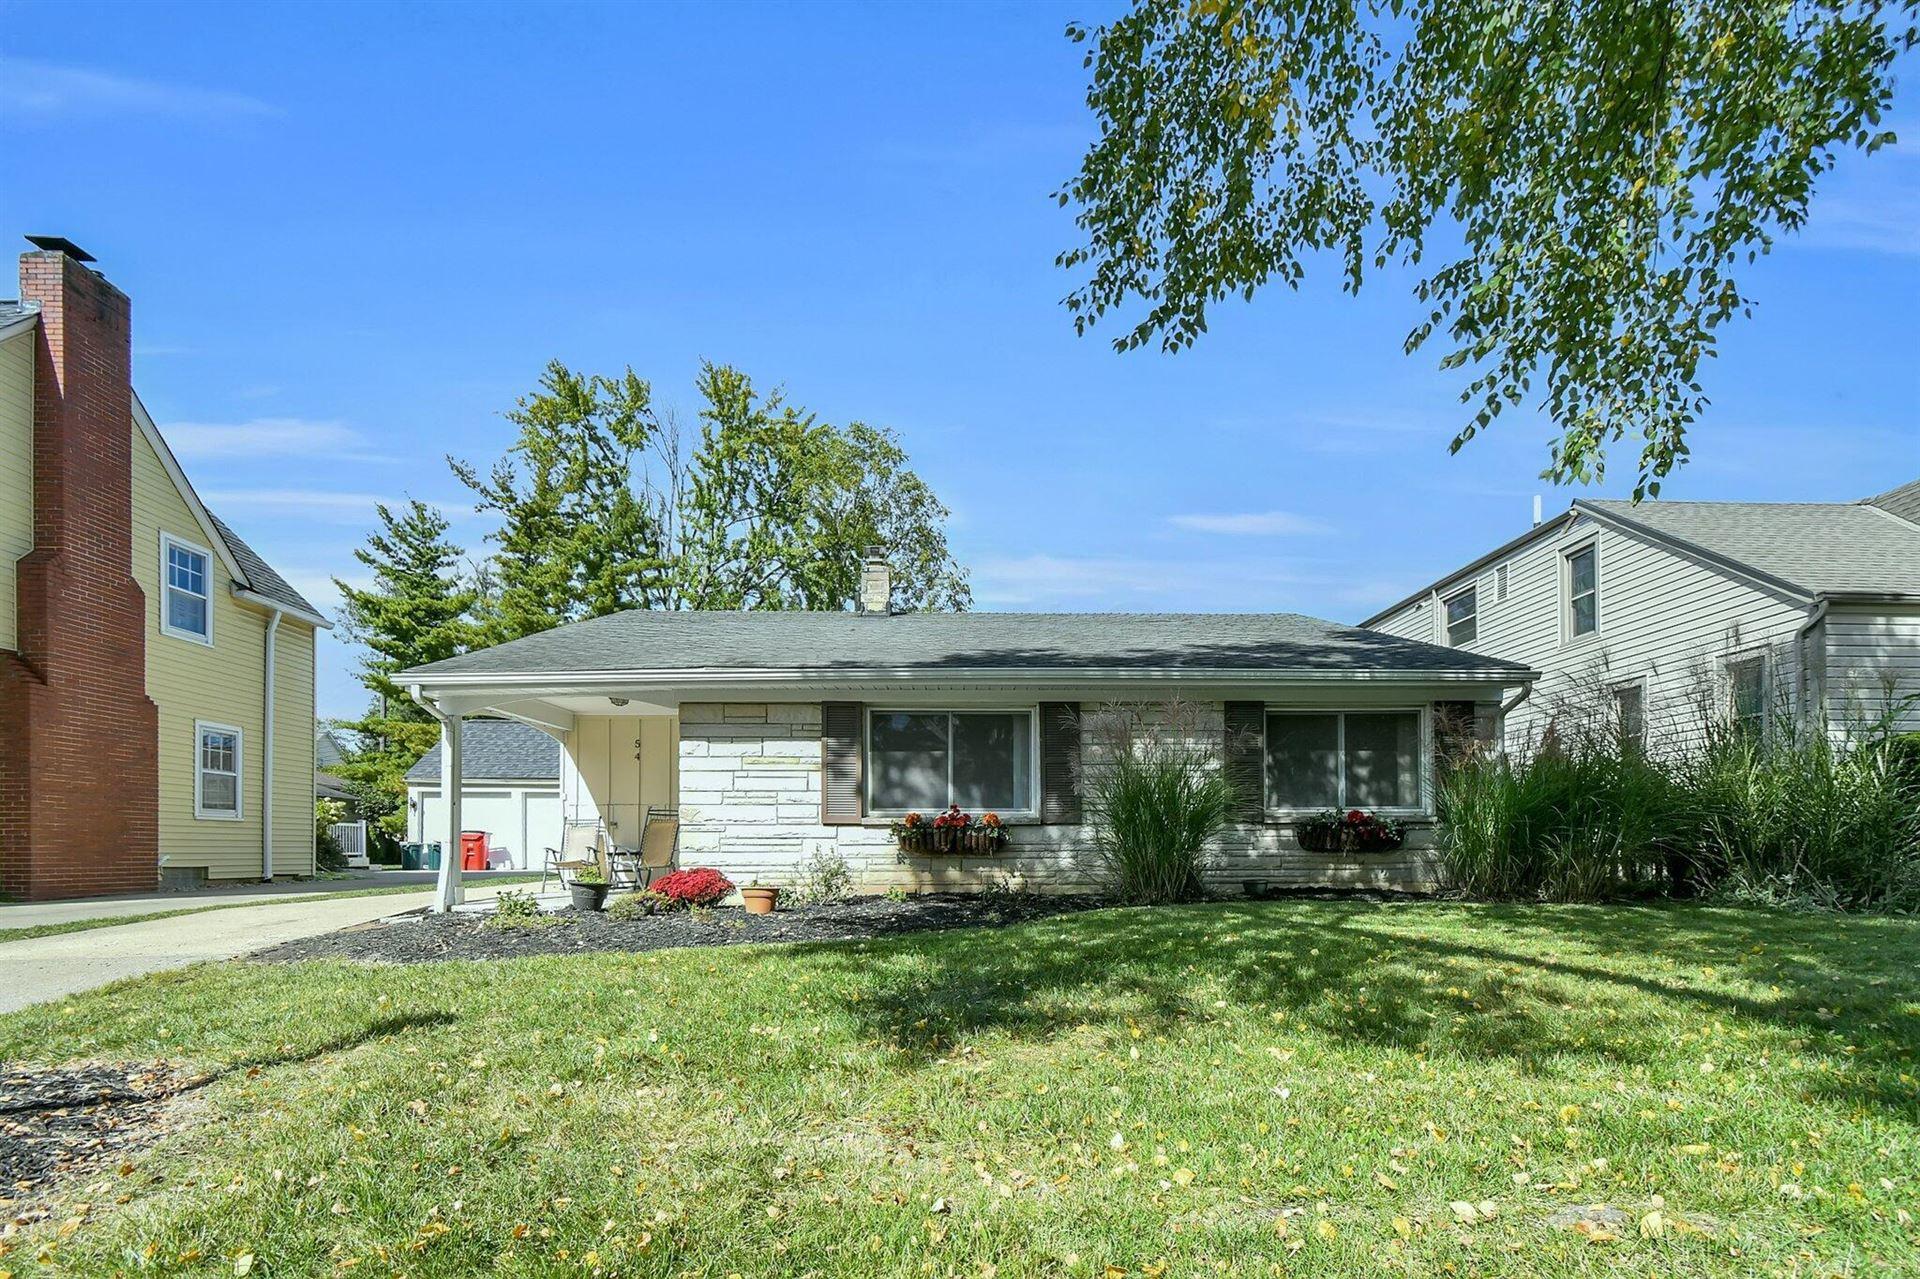 Photo of 54 Orchard Drive, Worthington, OH 43085 (MLS # 221039001)